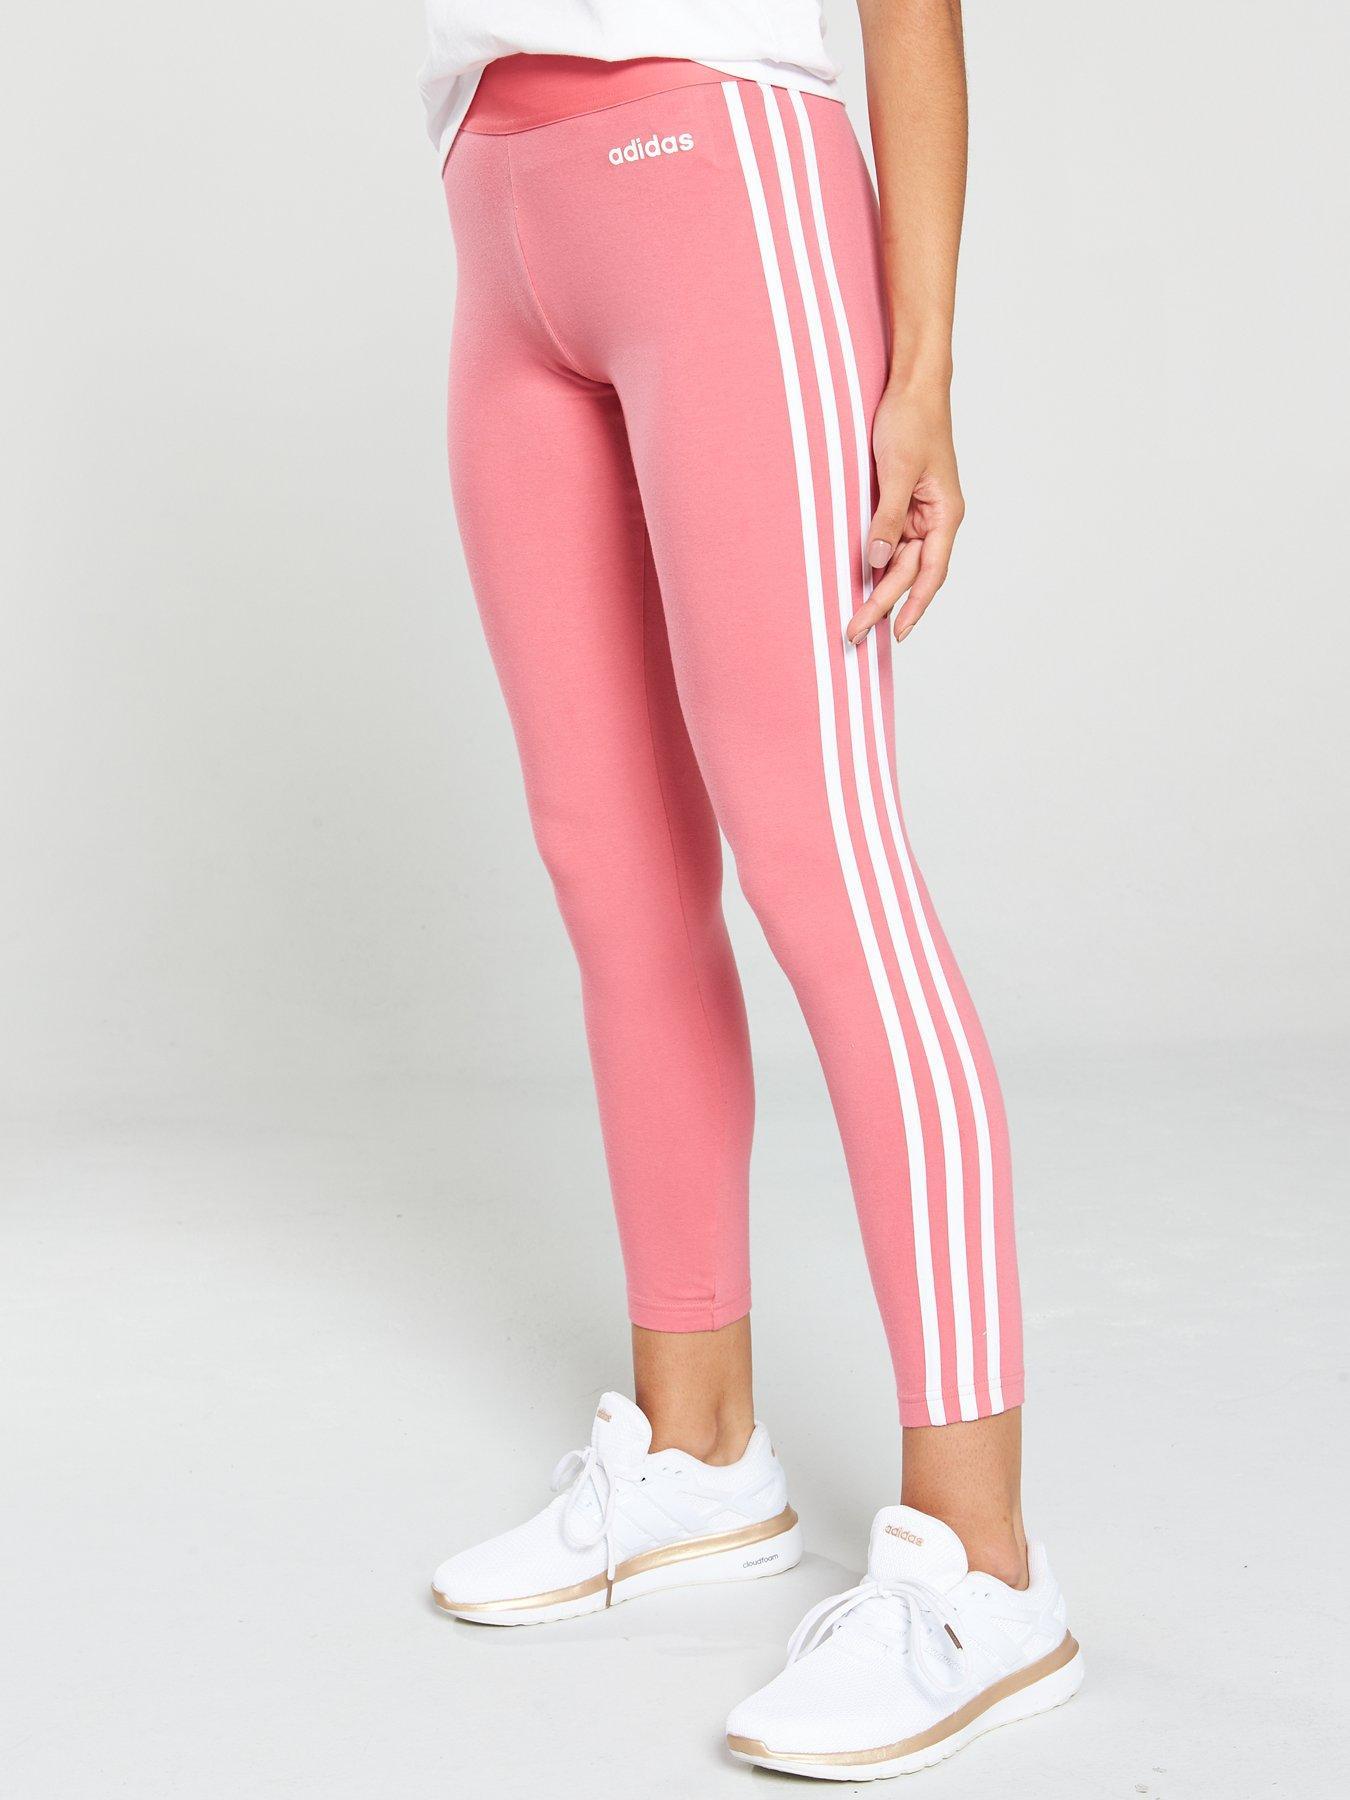 adidas wind pants petite, Adidas new mens cc ride w running